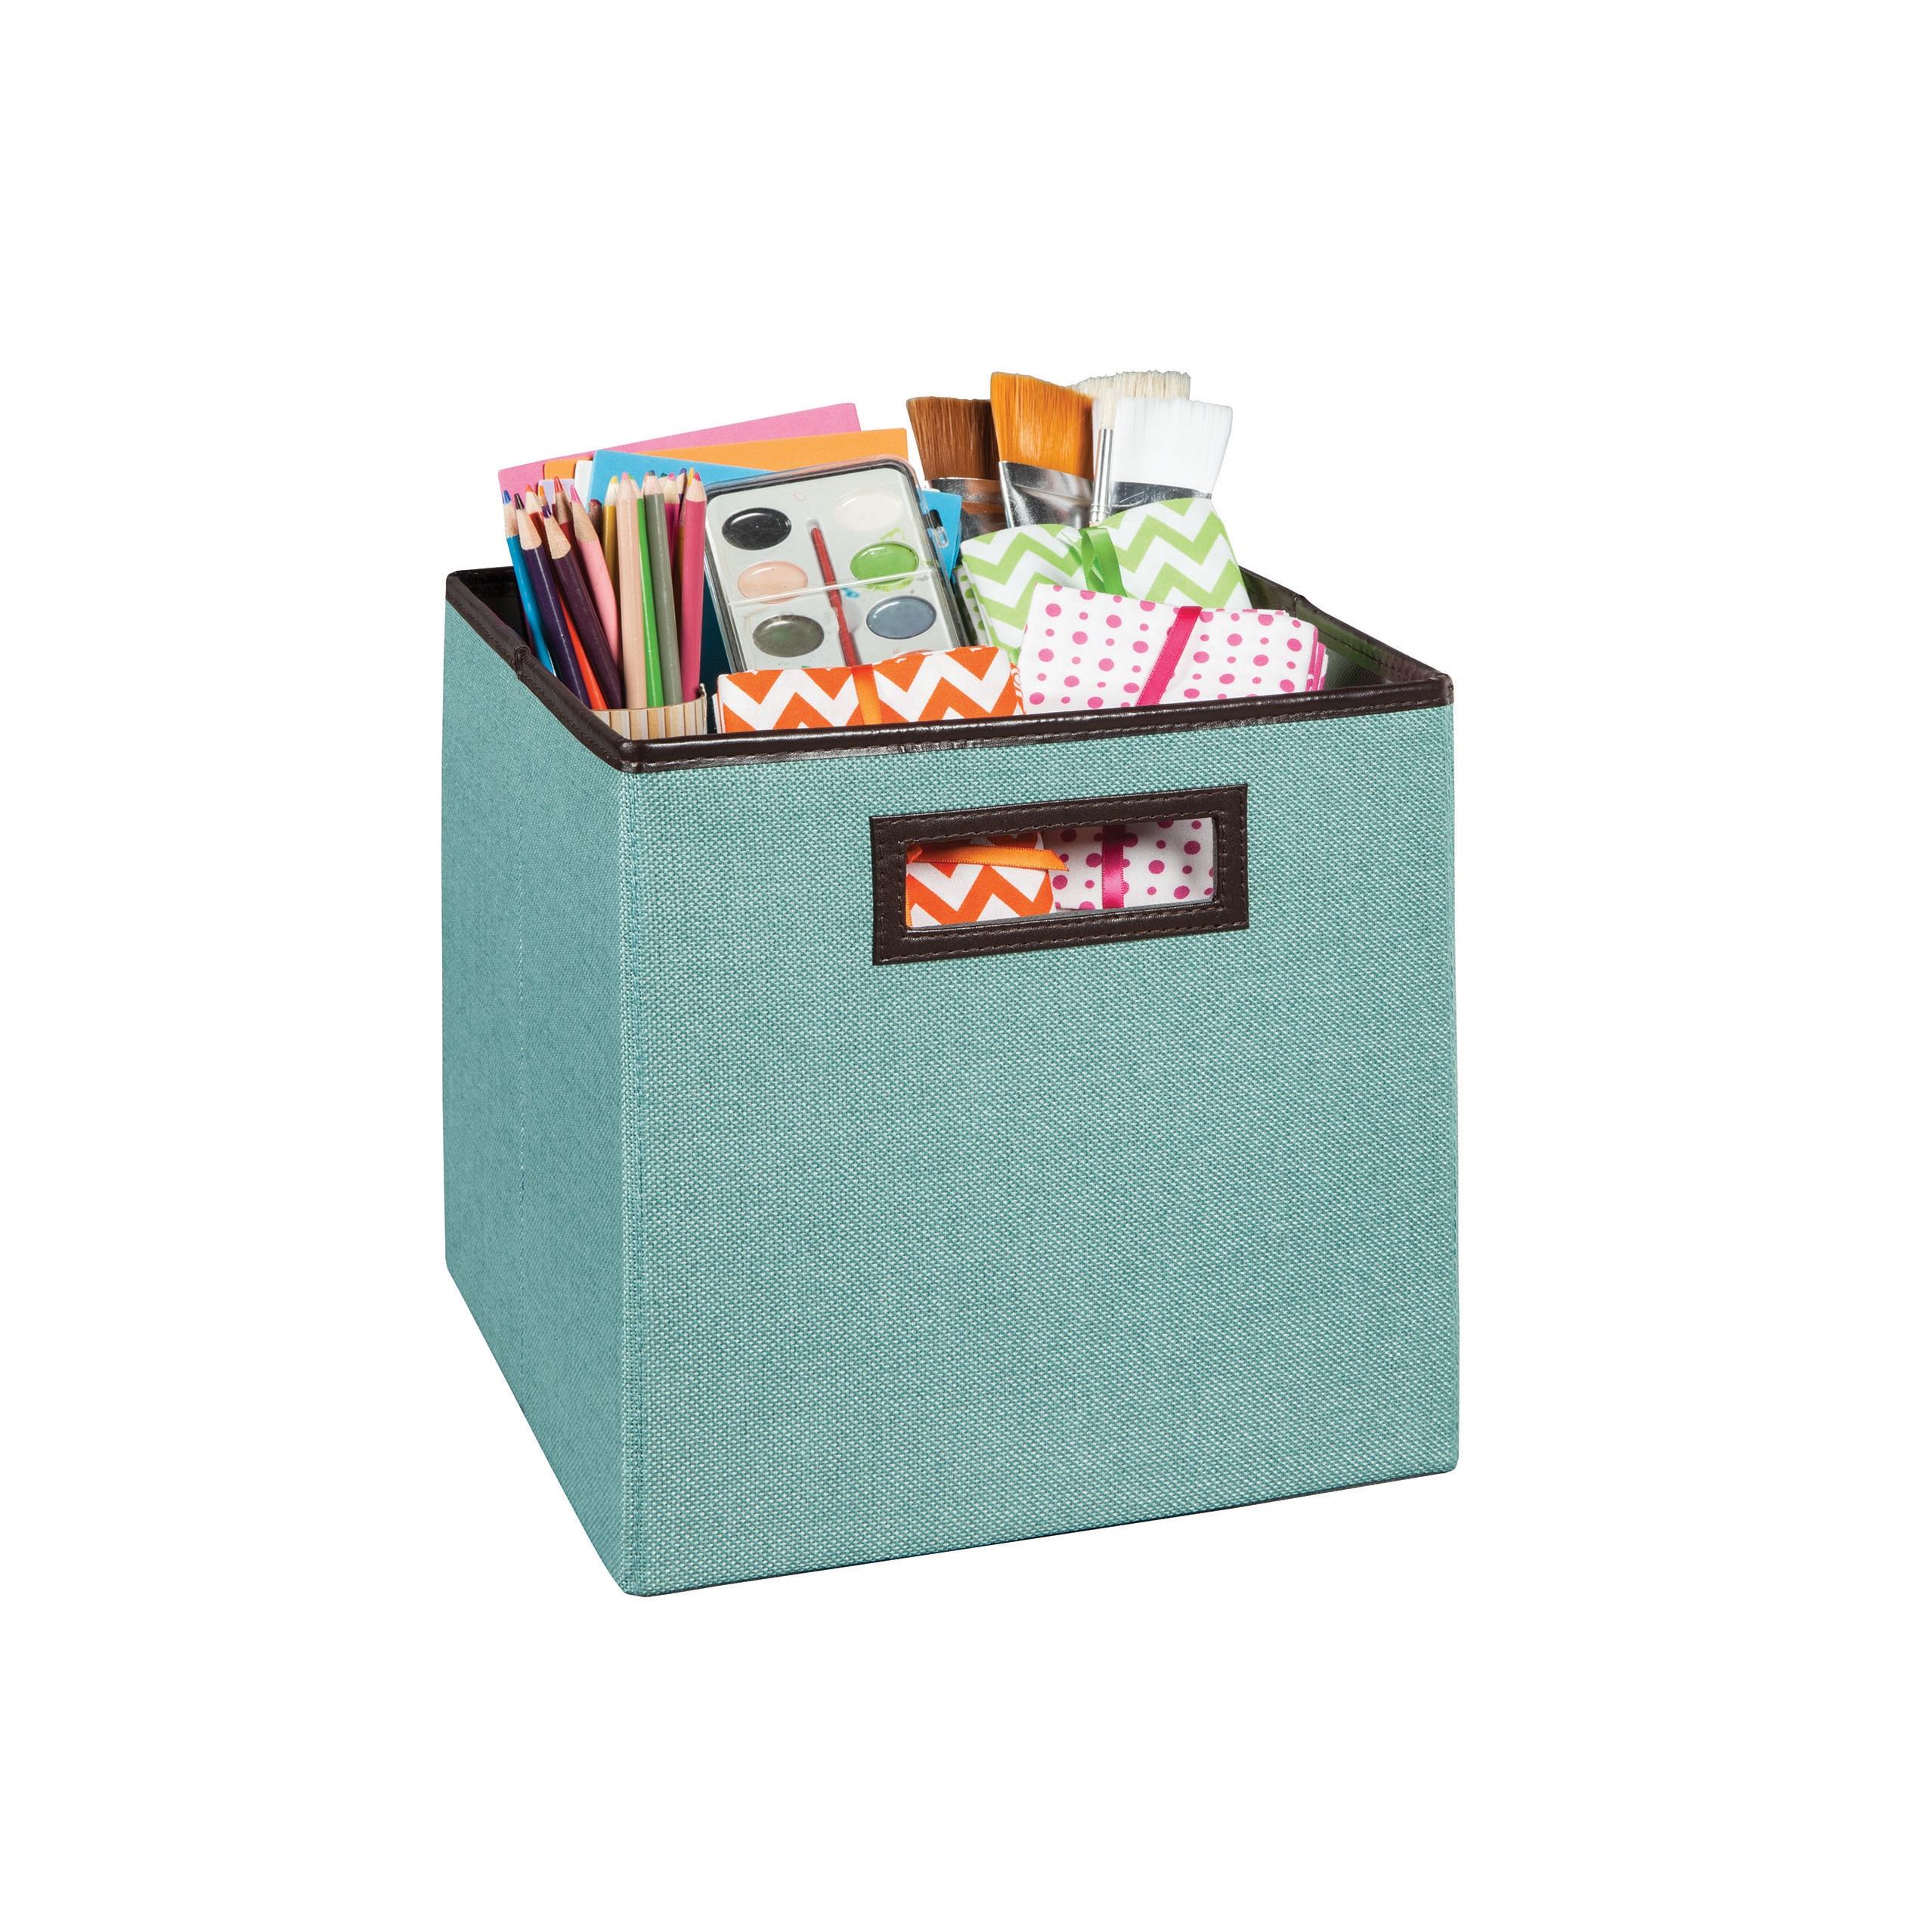 Closetmaid Premium Cubeicals Fabric Storage Bin (caribbea.